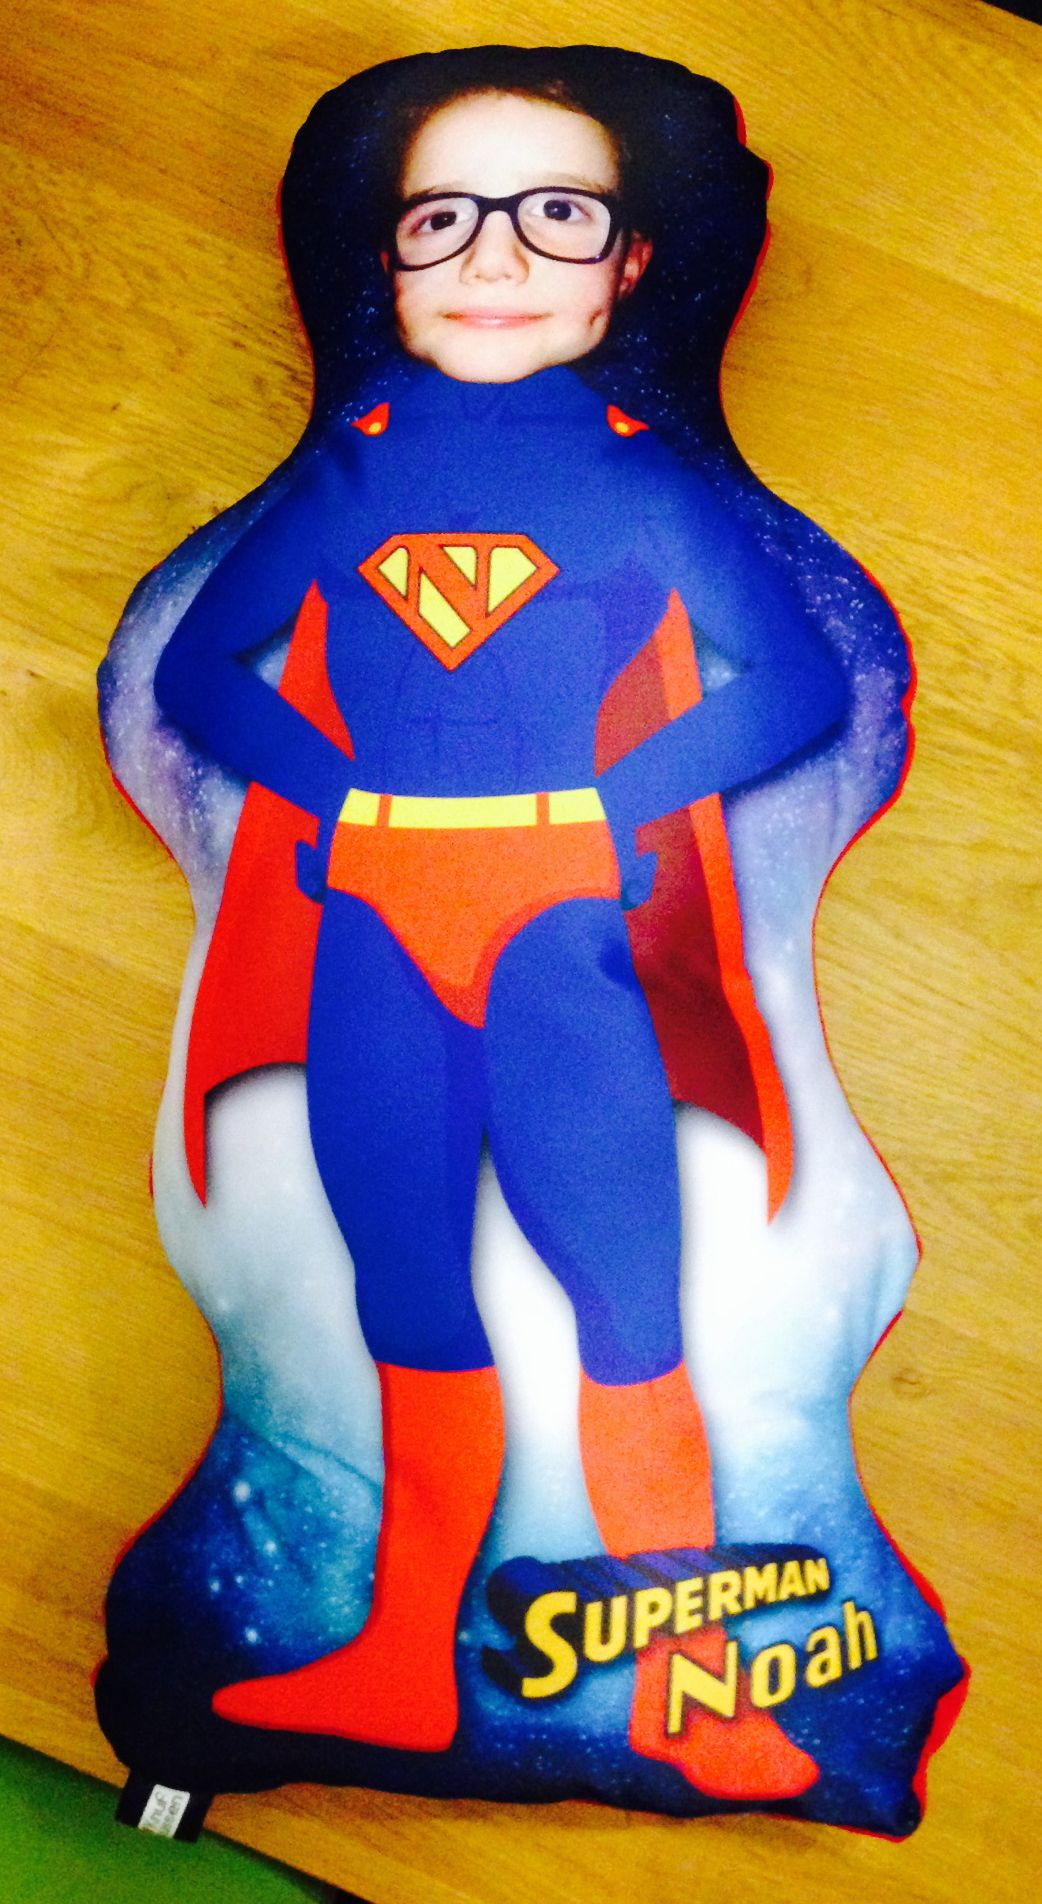 Knufkussen Superman, ontwerp en uitvoering Suture. ZIe www.mliu.nl